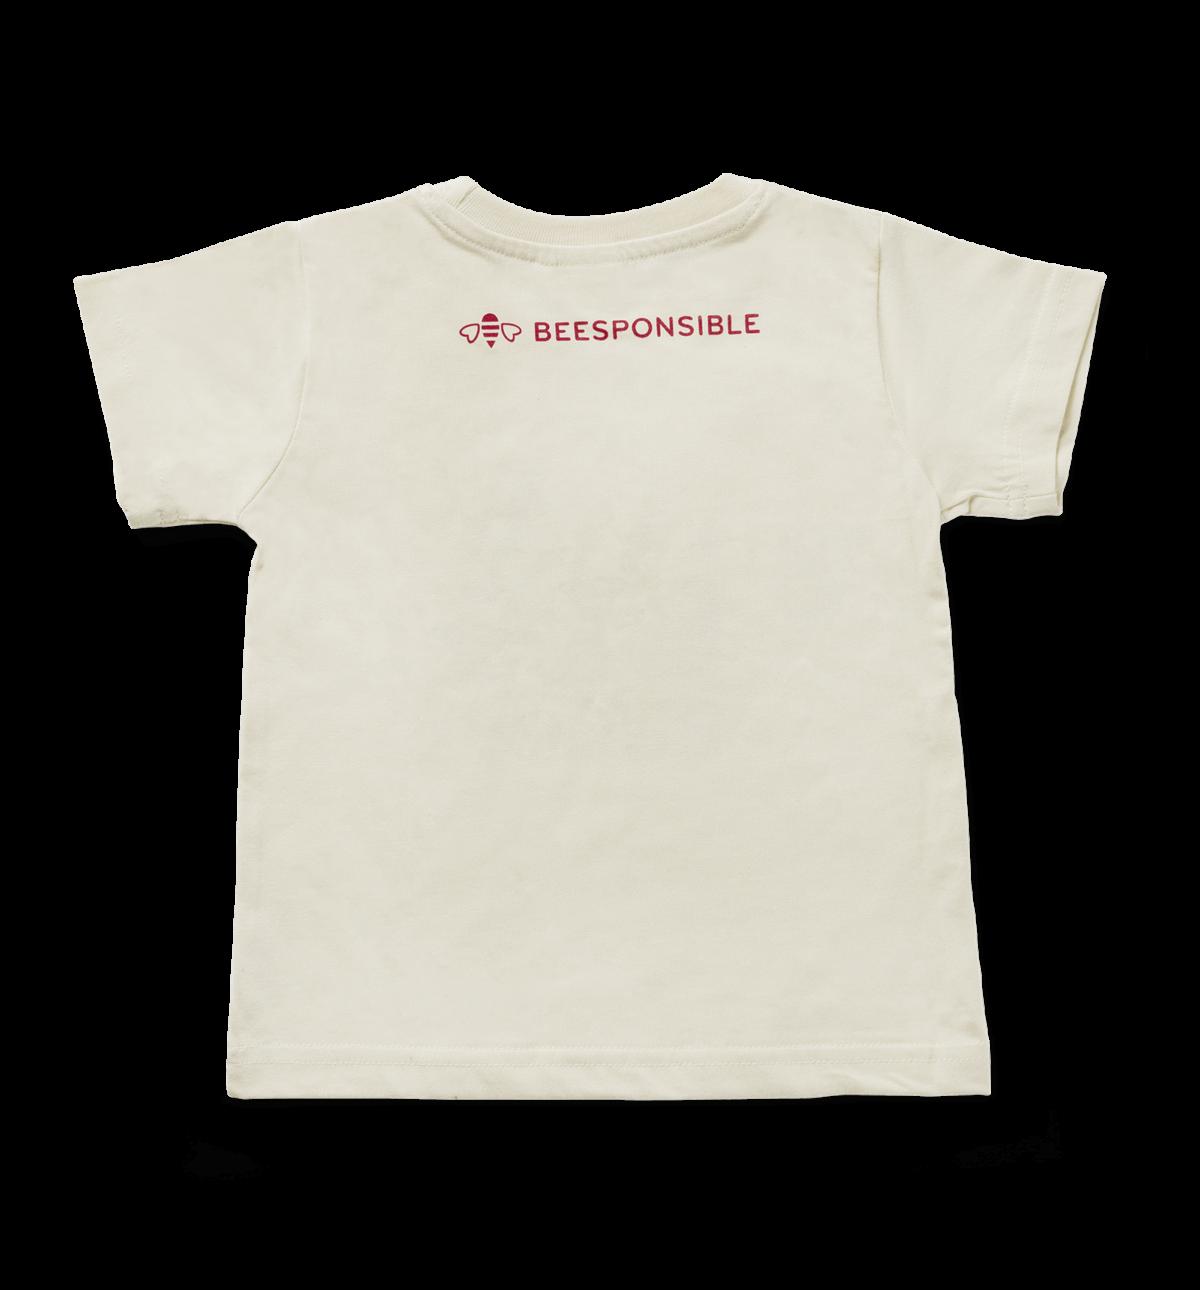 Beesponsible Toddler T-shirt Back - Beesponsible Logo